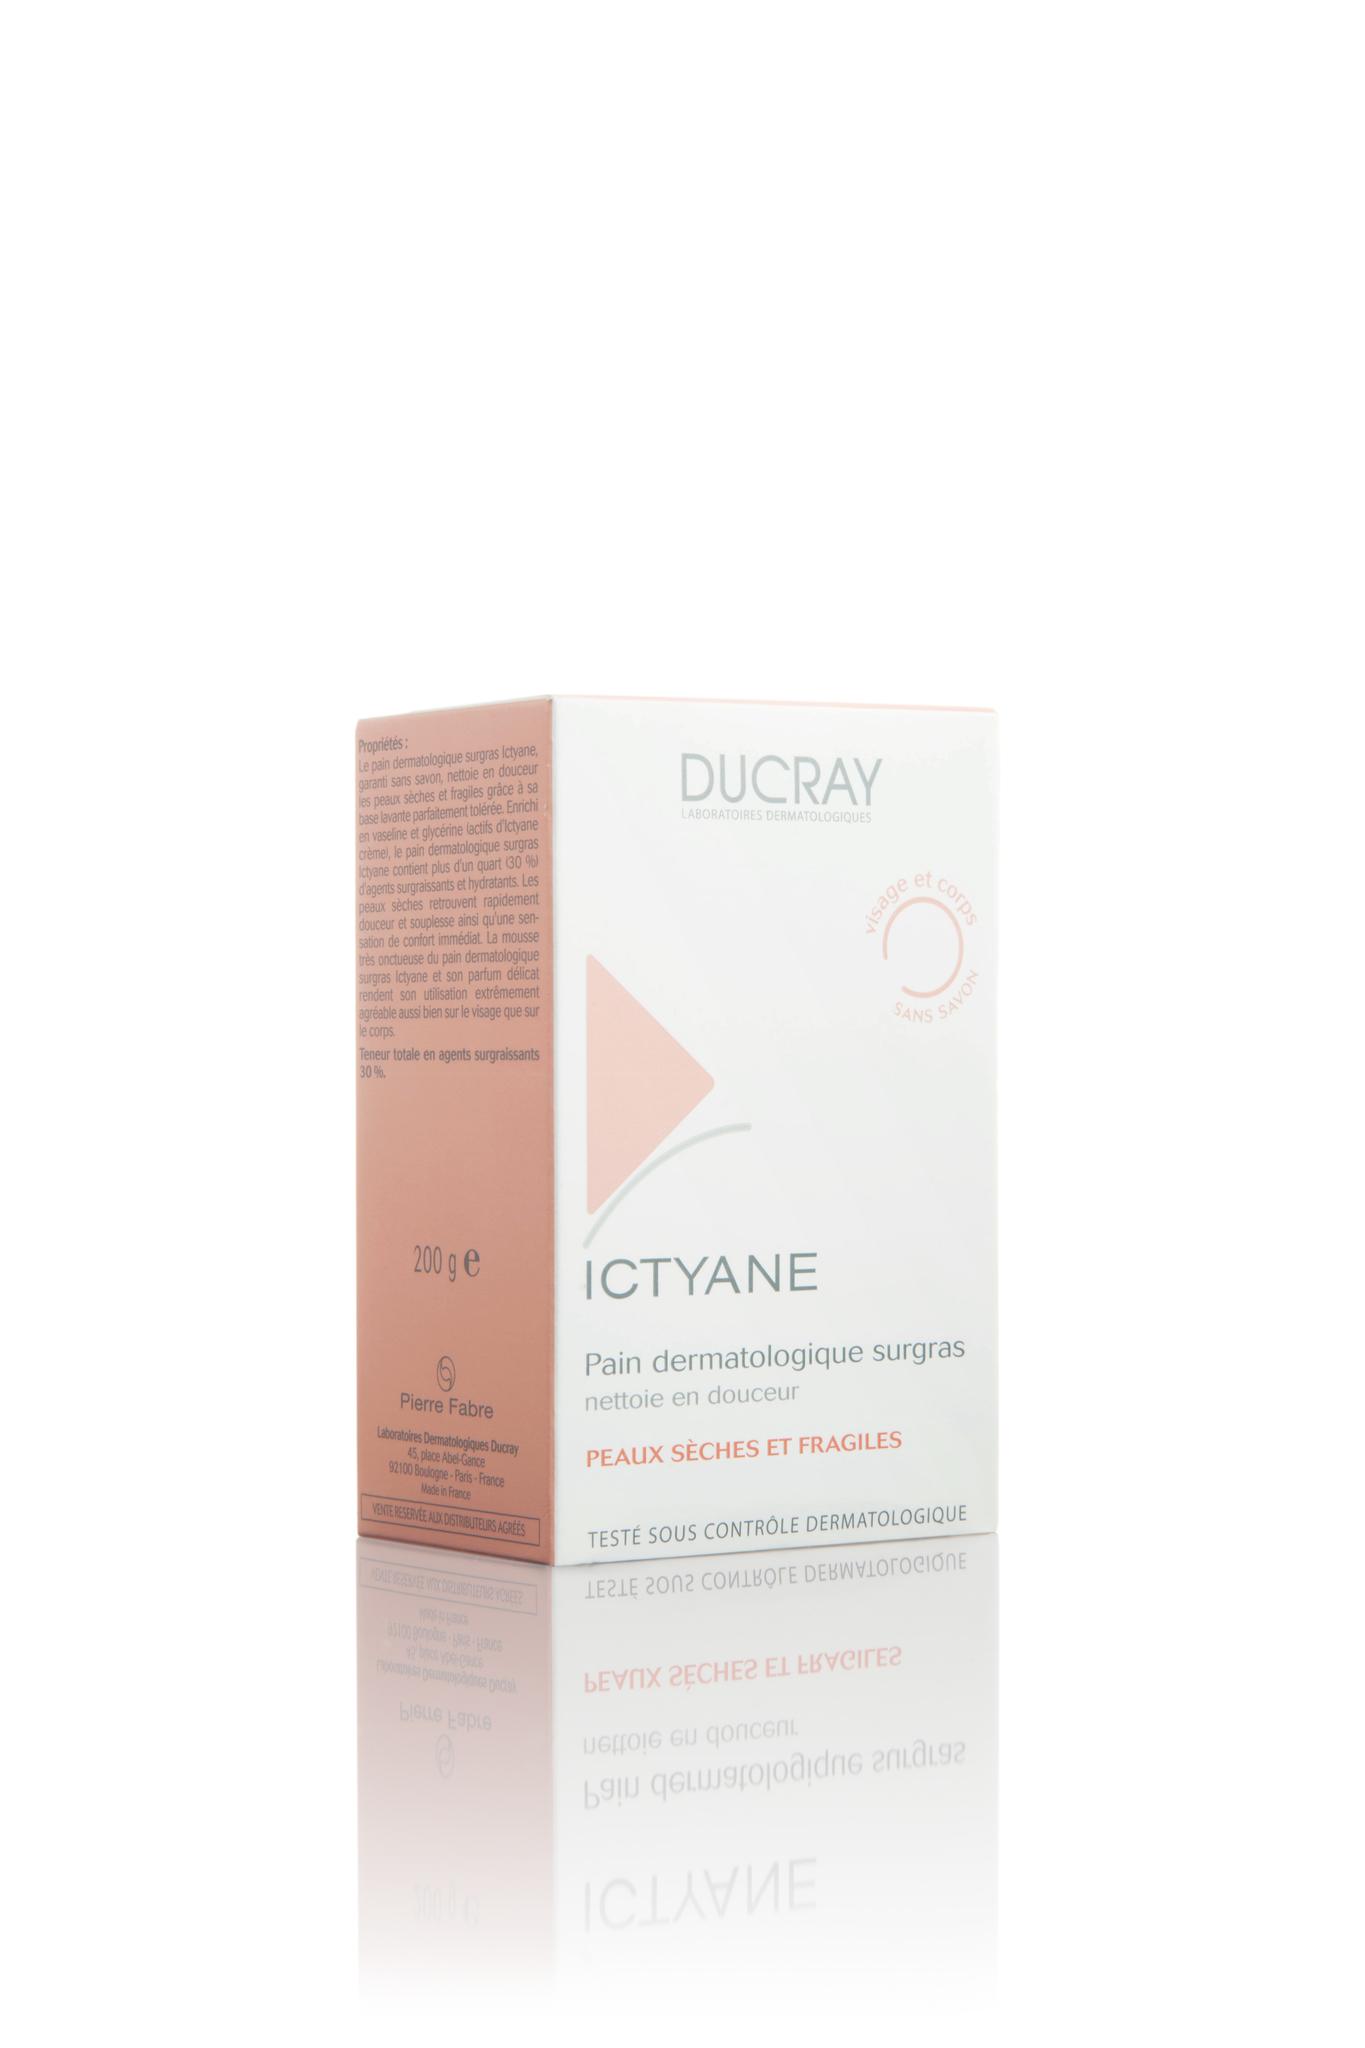 Ducray Ictyane мыло 200 г.